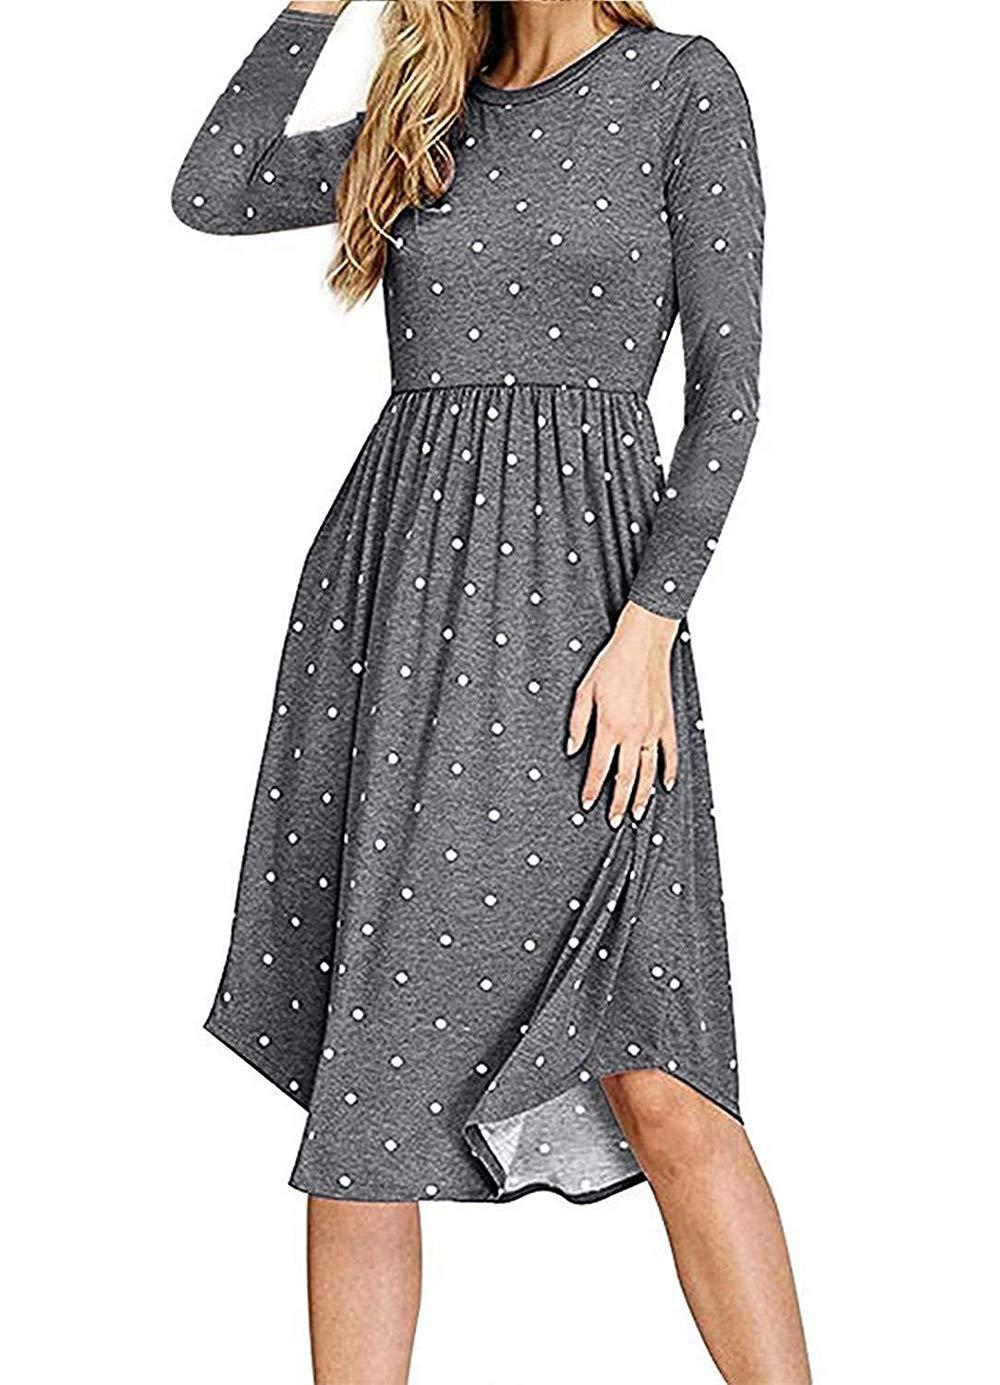 AMCLOS Women Pleated Polka Dot Pocket Swing Casual Midi T Shirt Dress Long Sleeve (Grey, L)